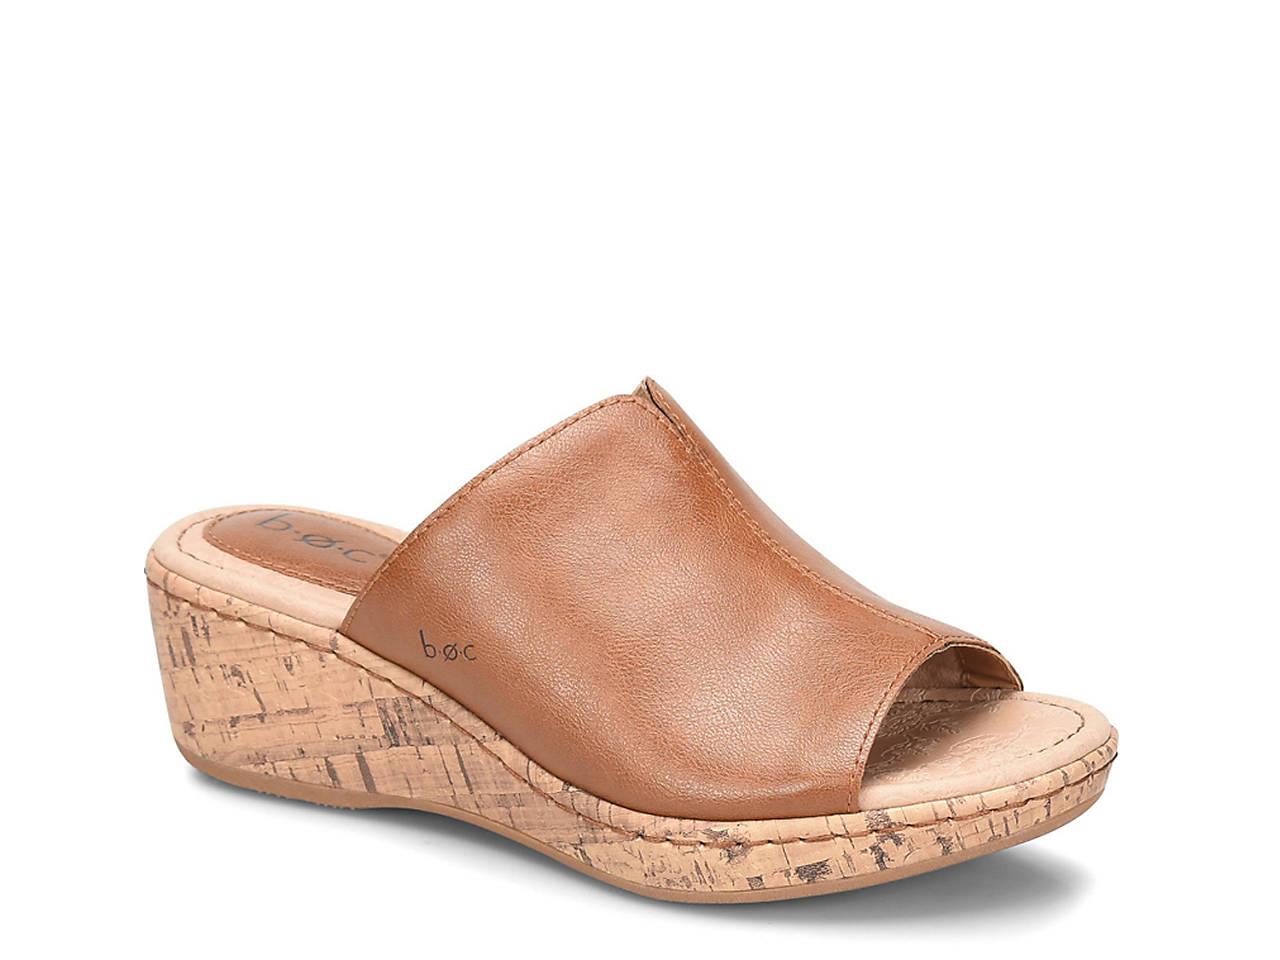 6331d3906 b.o.c Breezy Wedge Sandal Women s Shoes